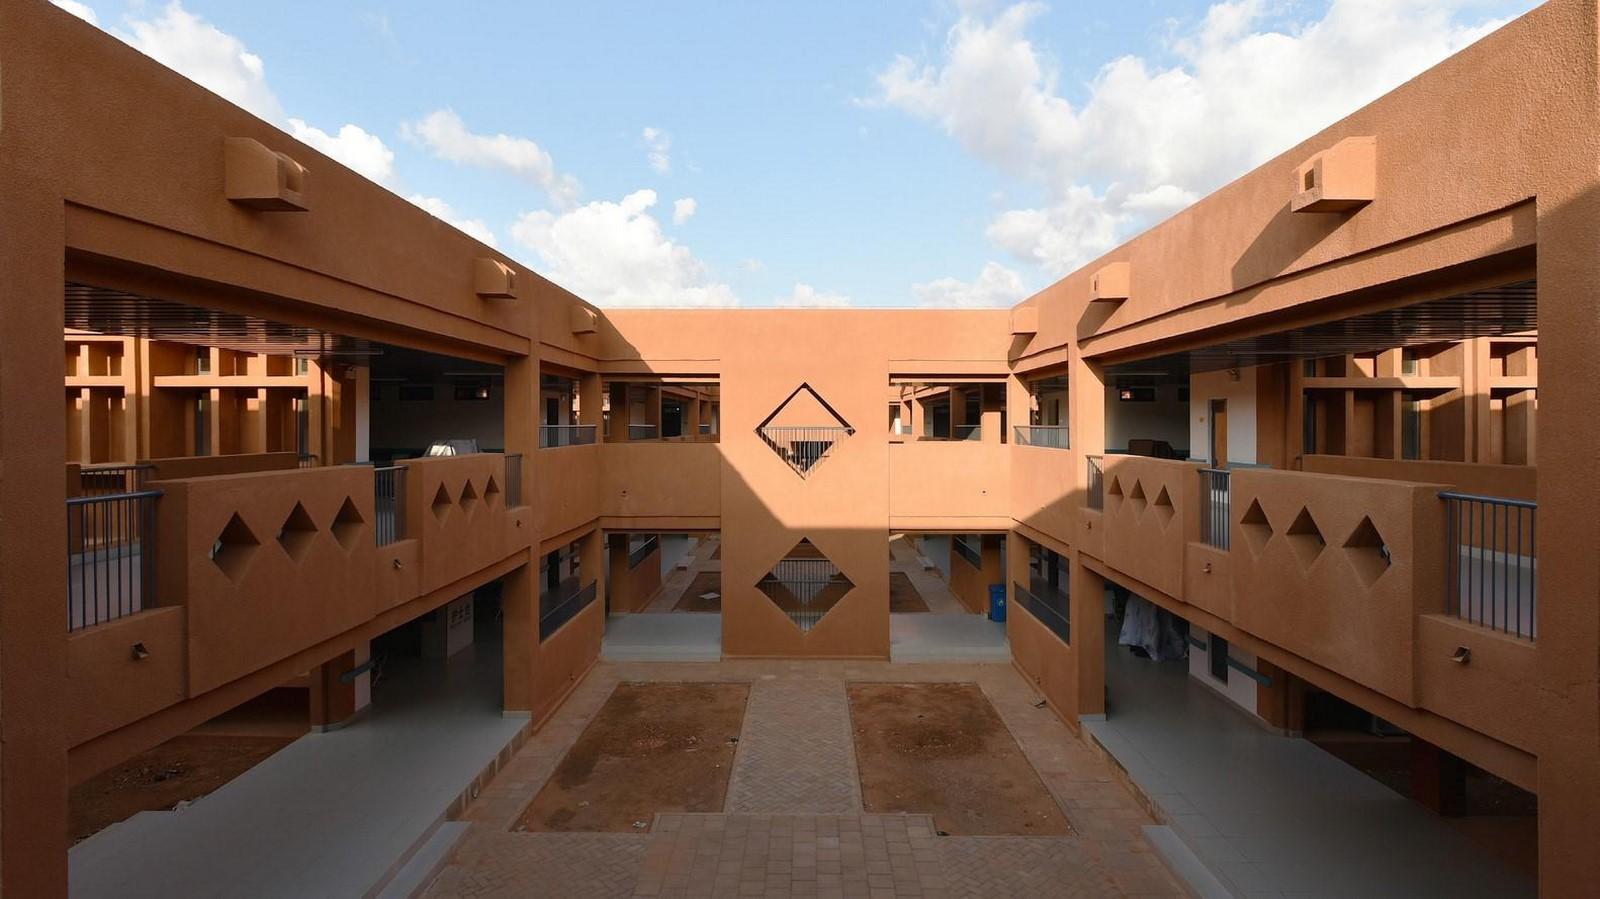 General Hospital of Niger - Sheet1